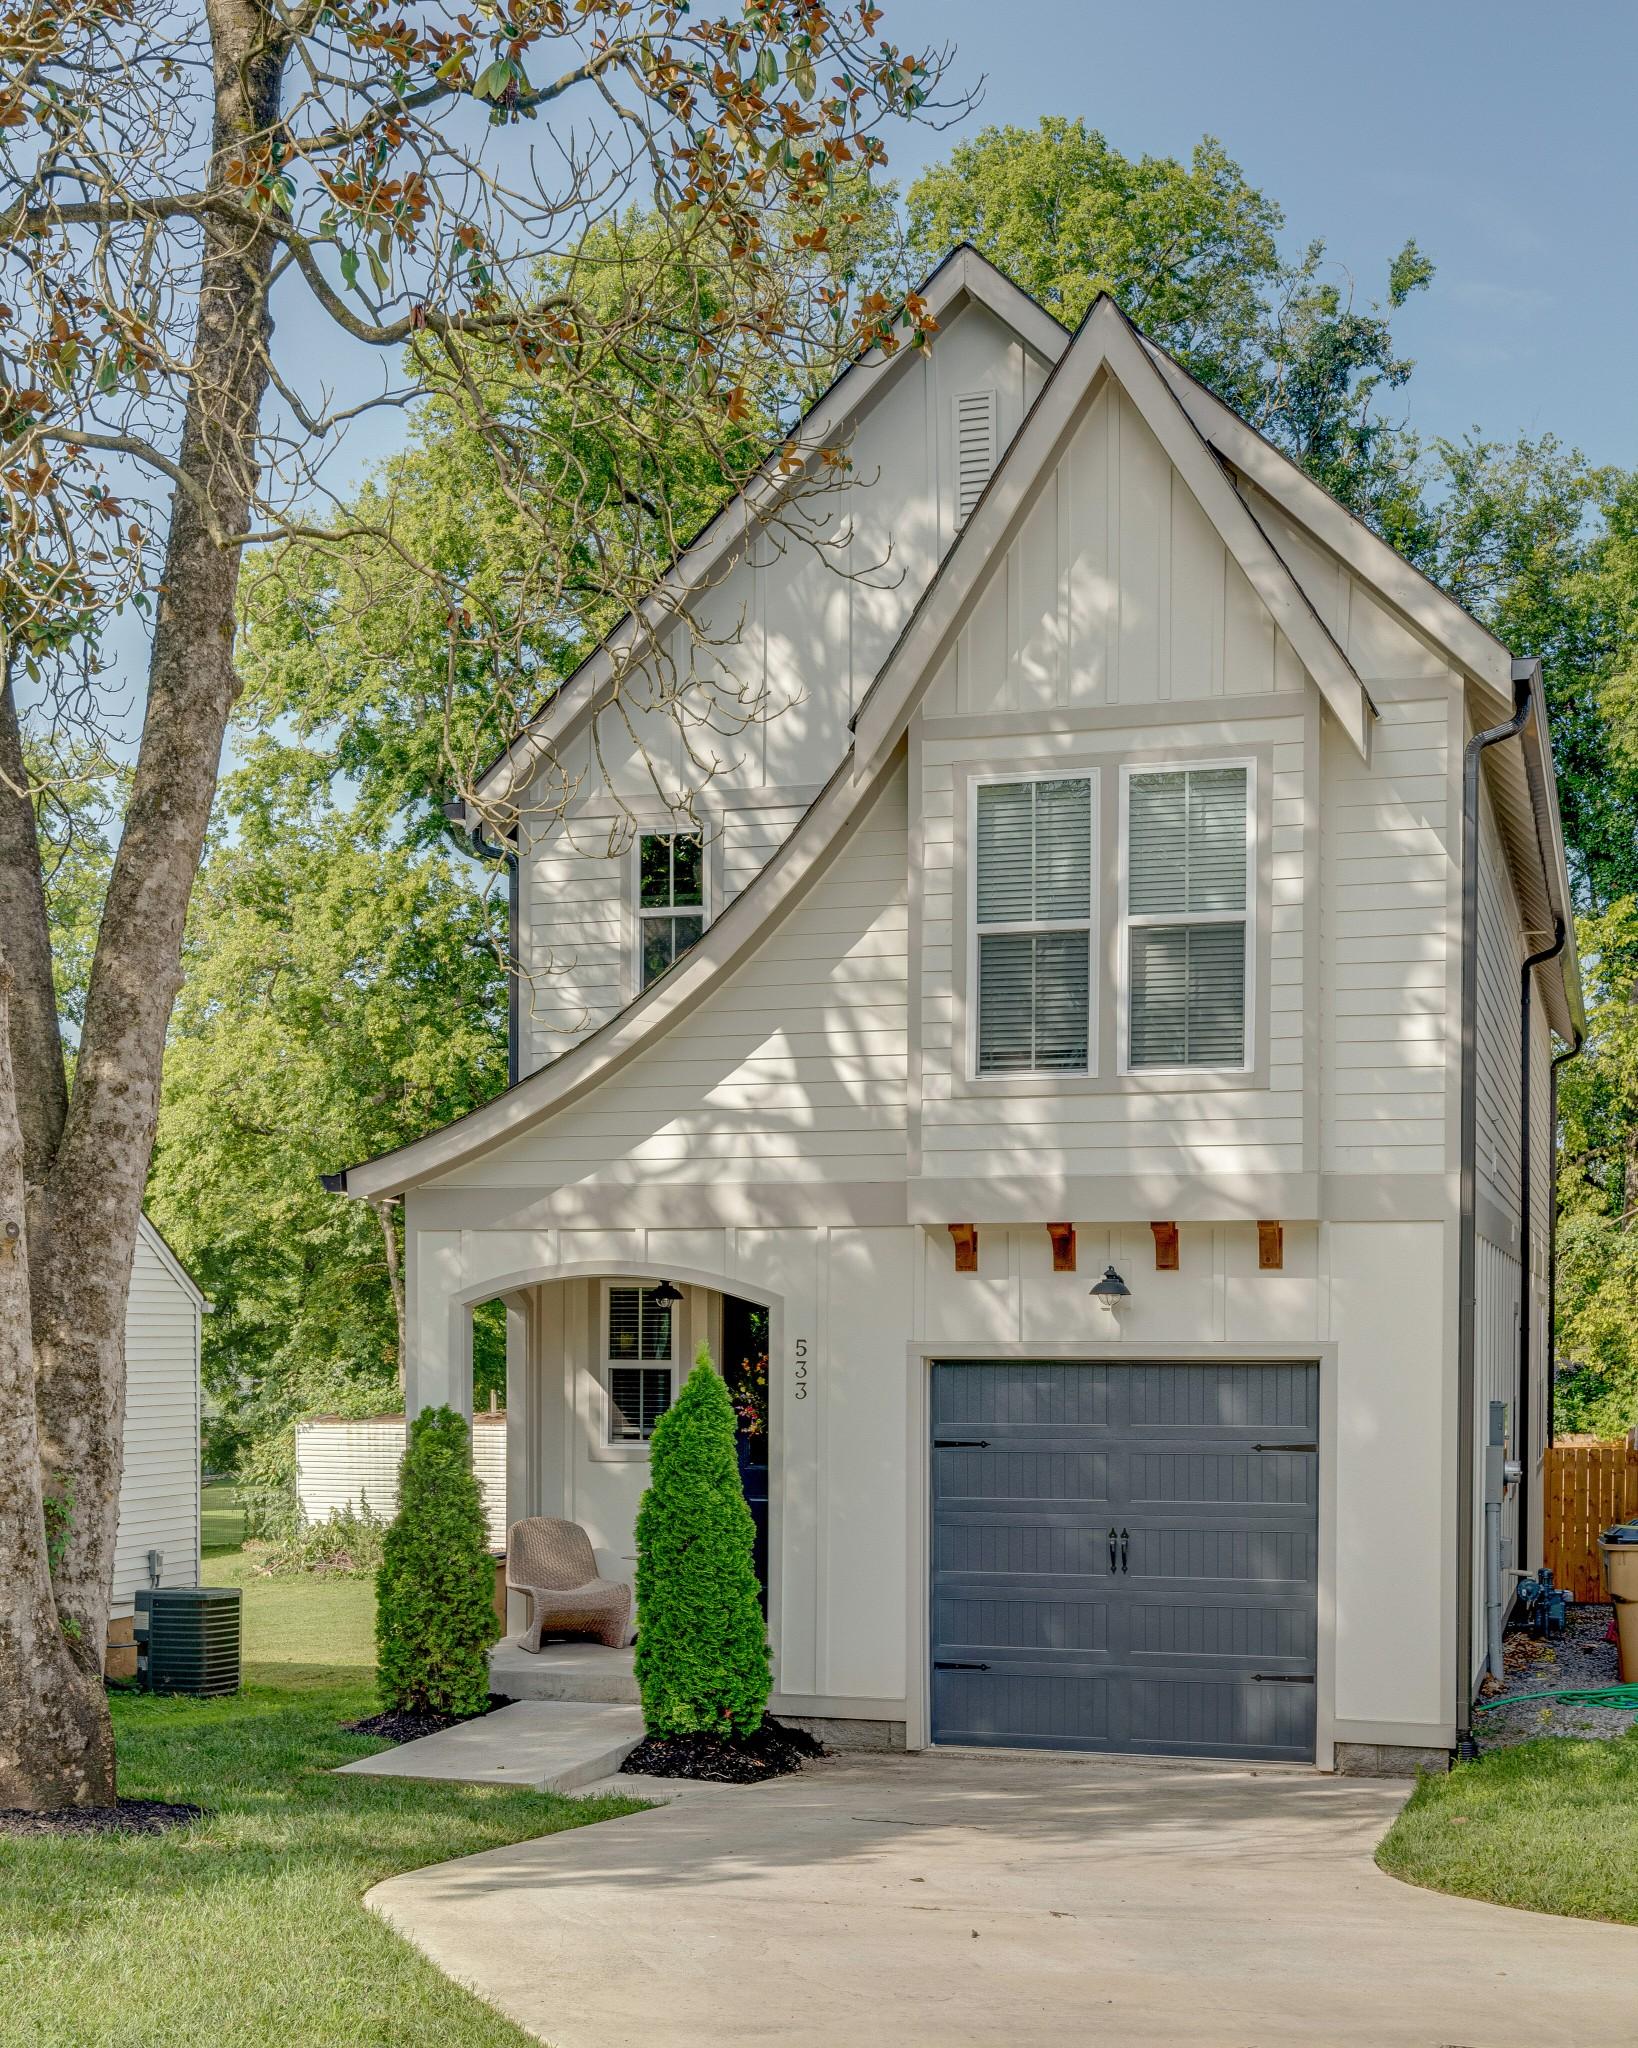 533 Croley Dr Property Photo - Nashville, TN real estate listing